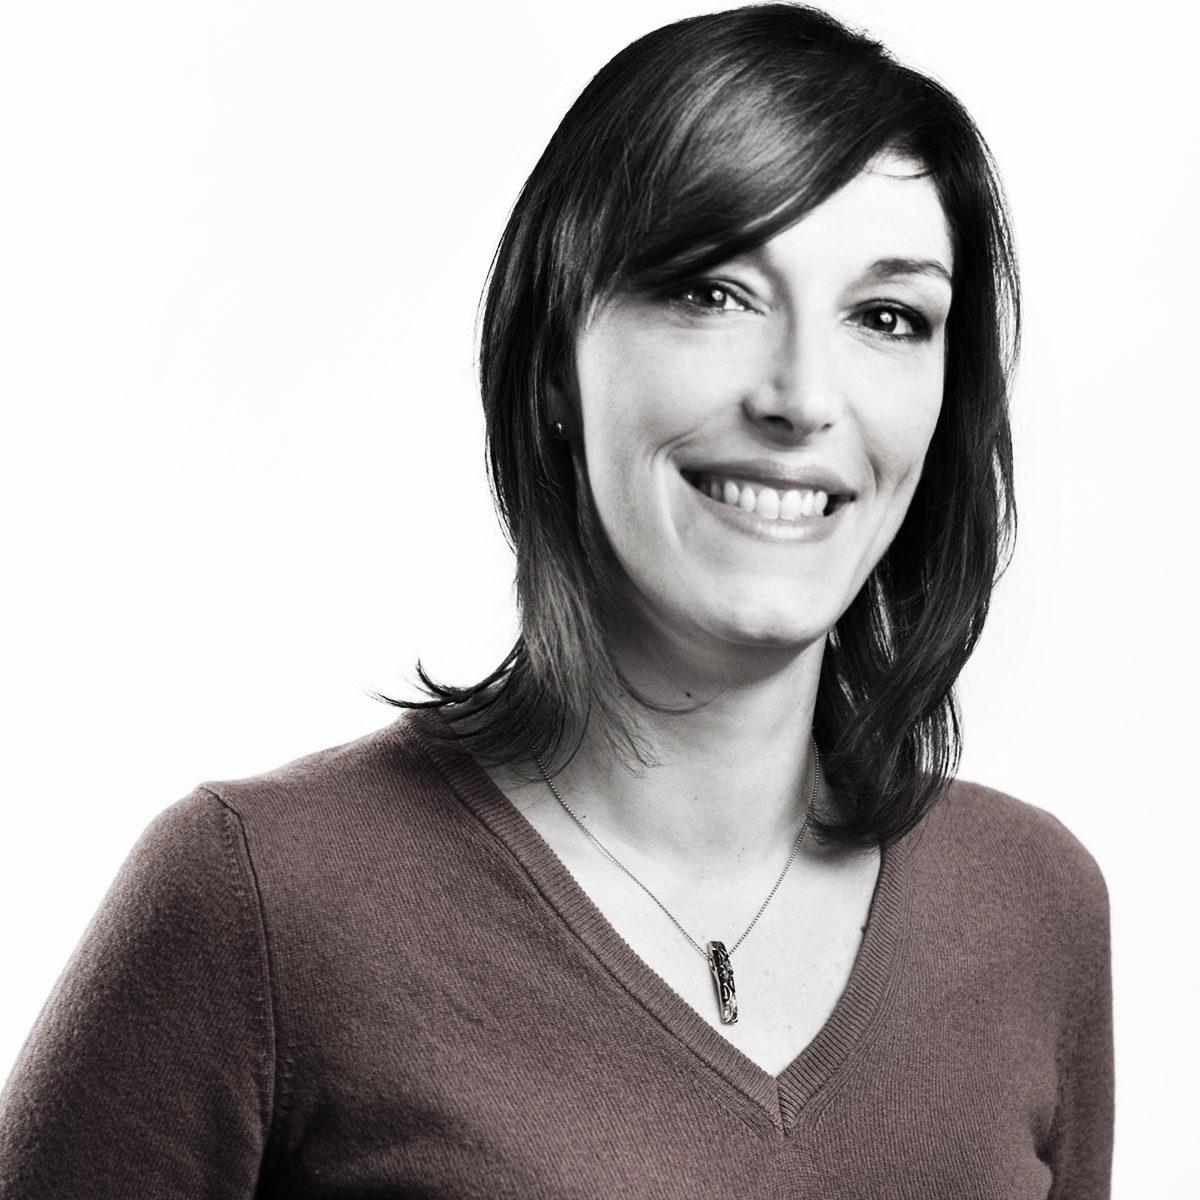 Giulia Blasi